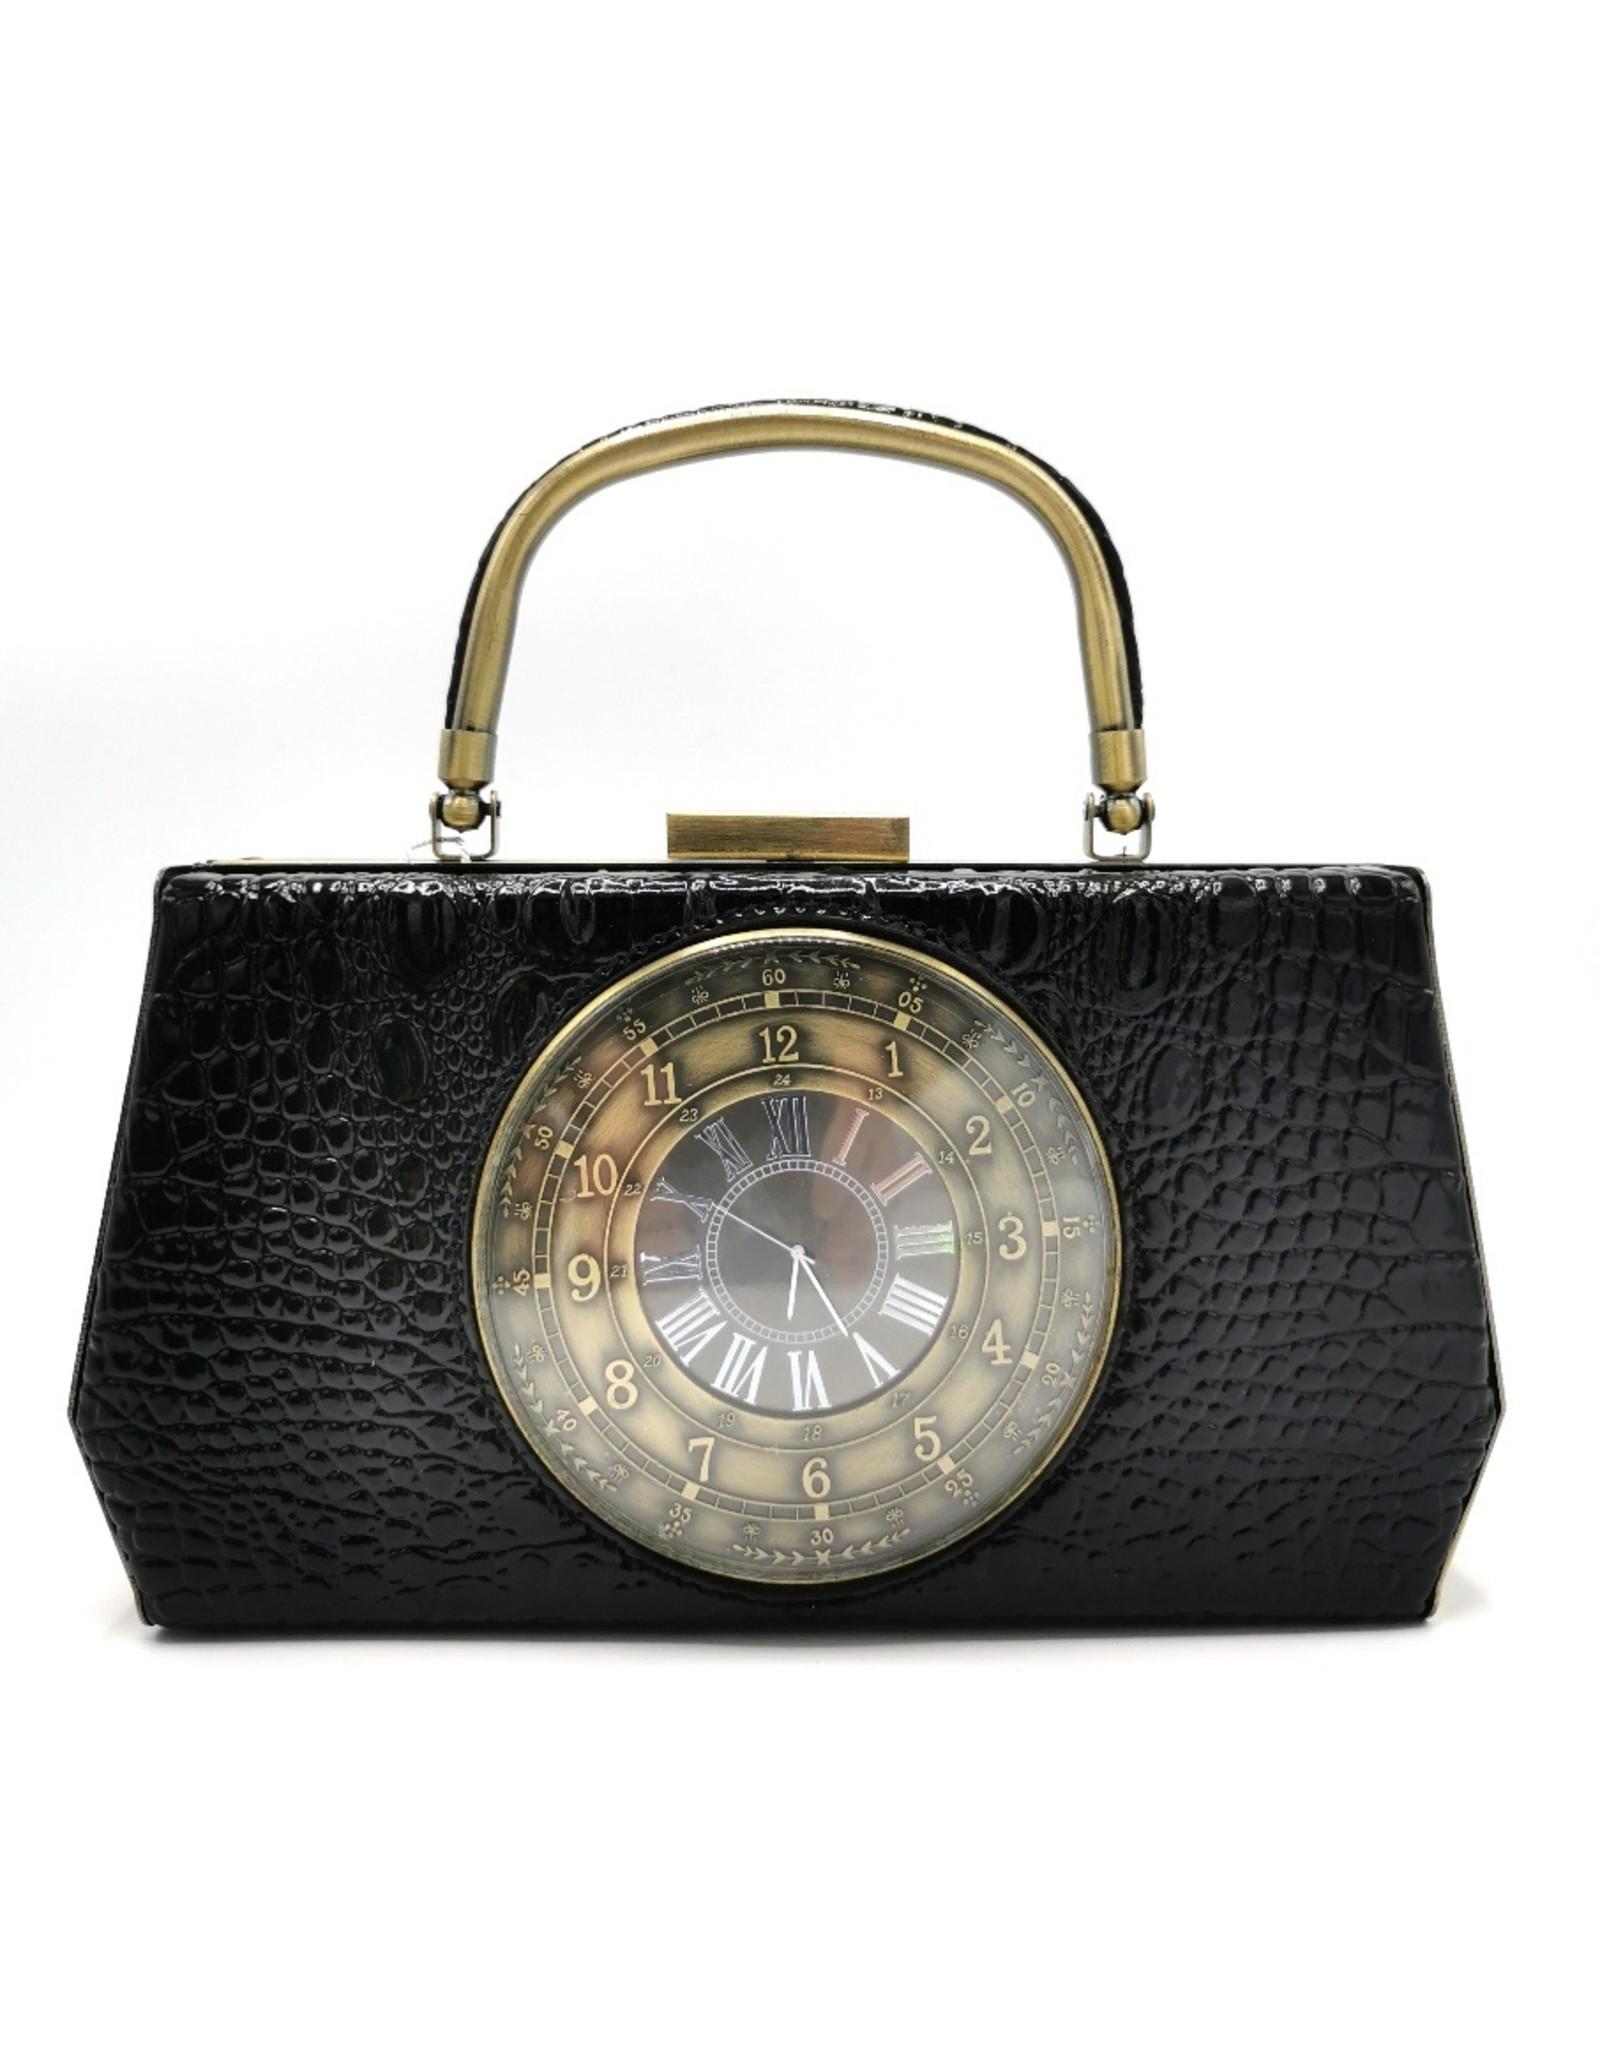 Magic Bags Retro tassen Vintage tassen - Handtas met Echte Klok vintage style zwart